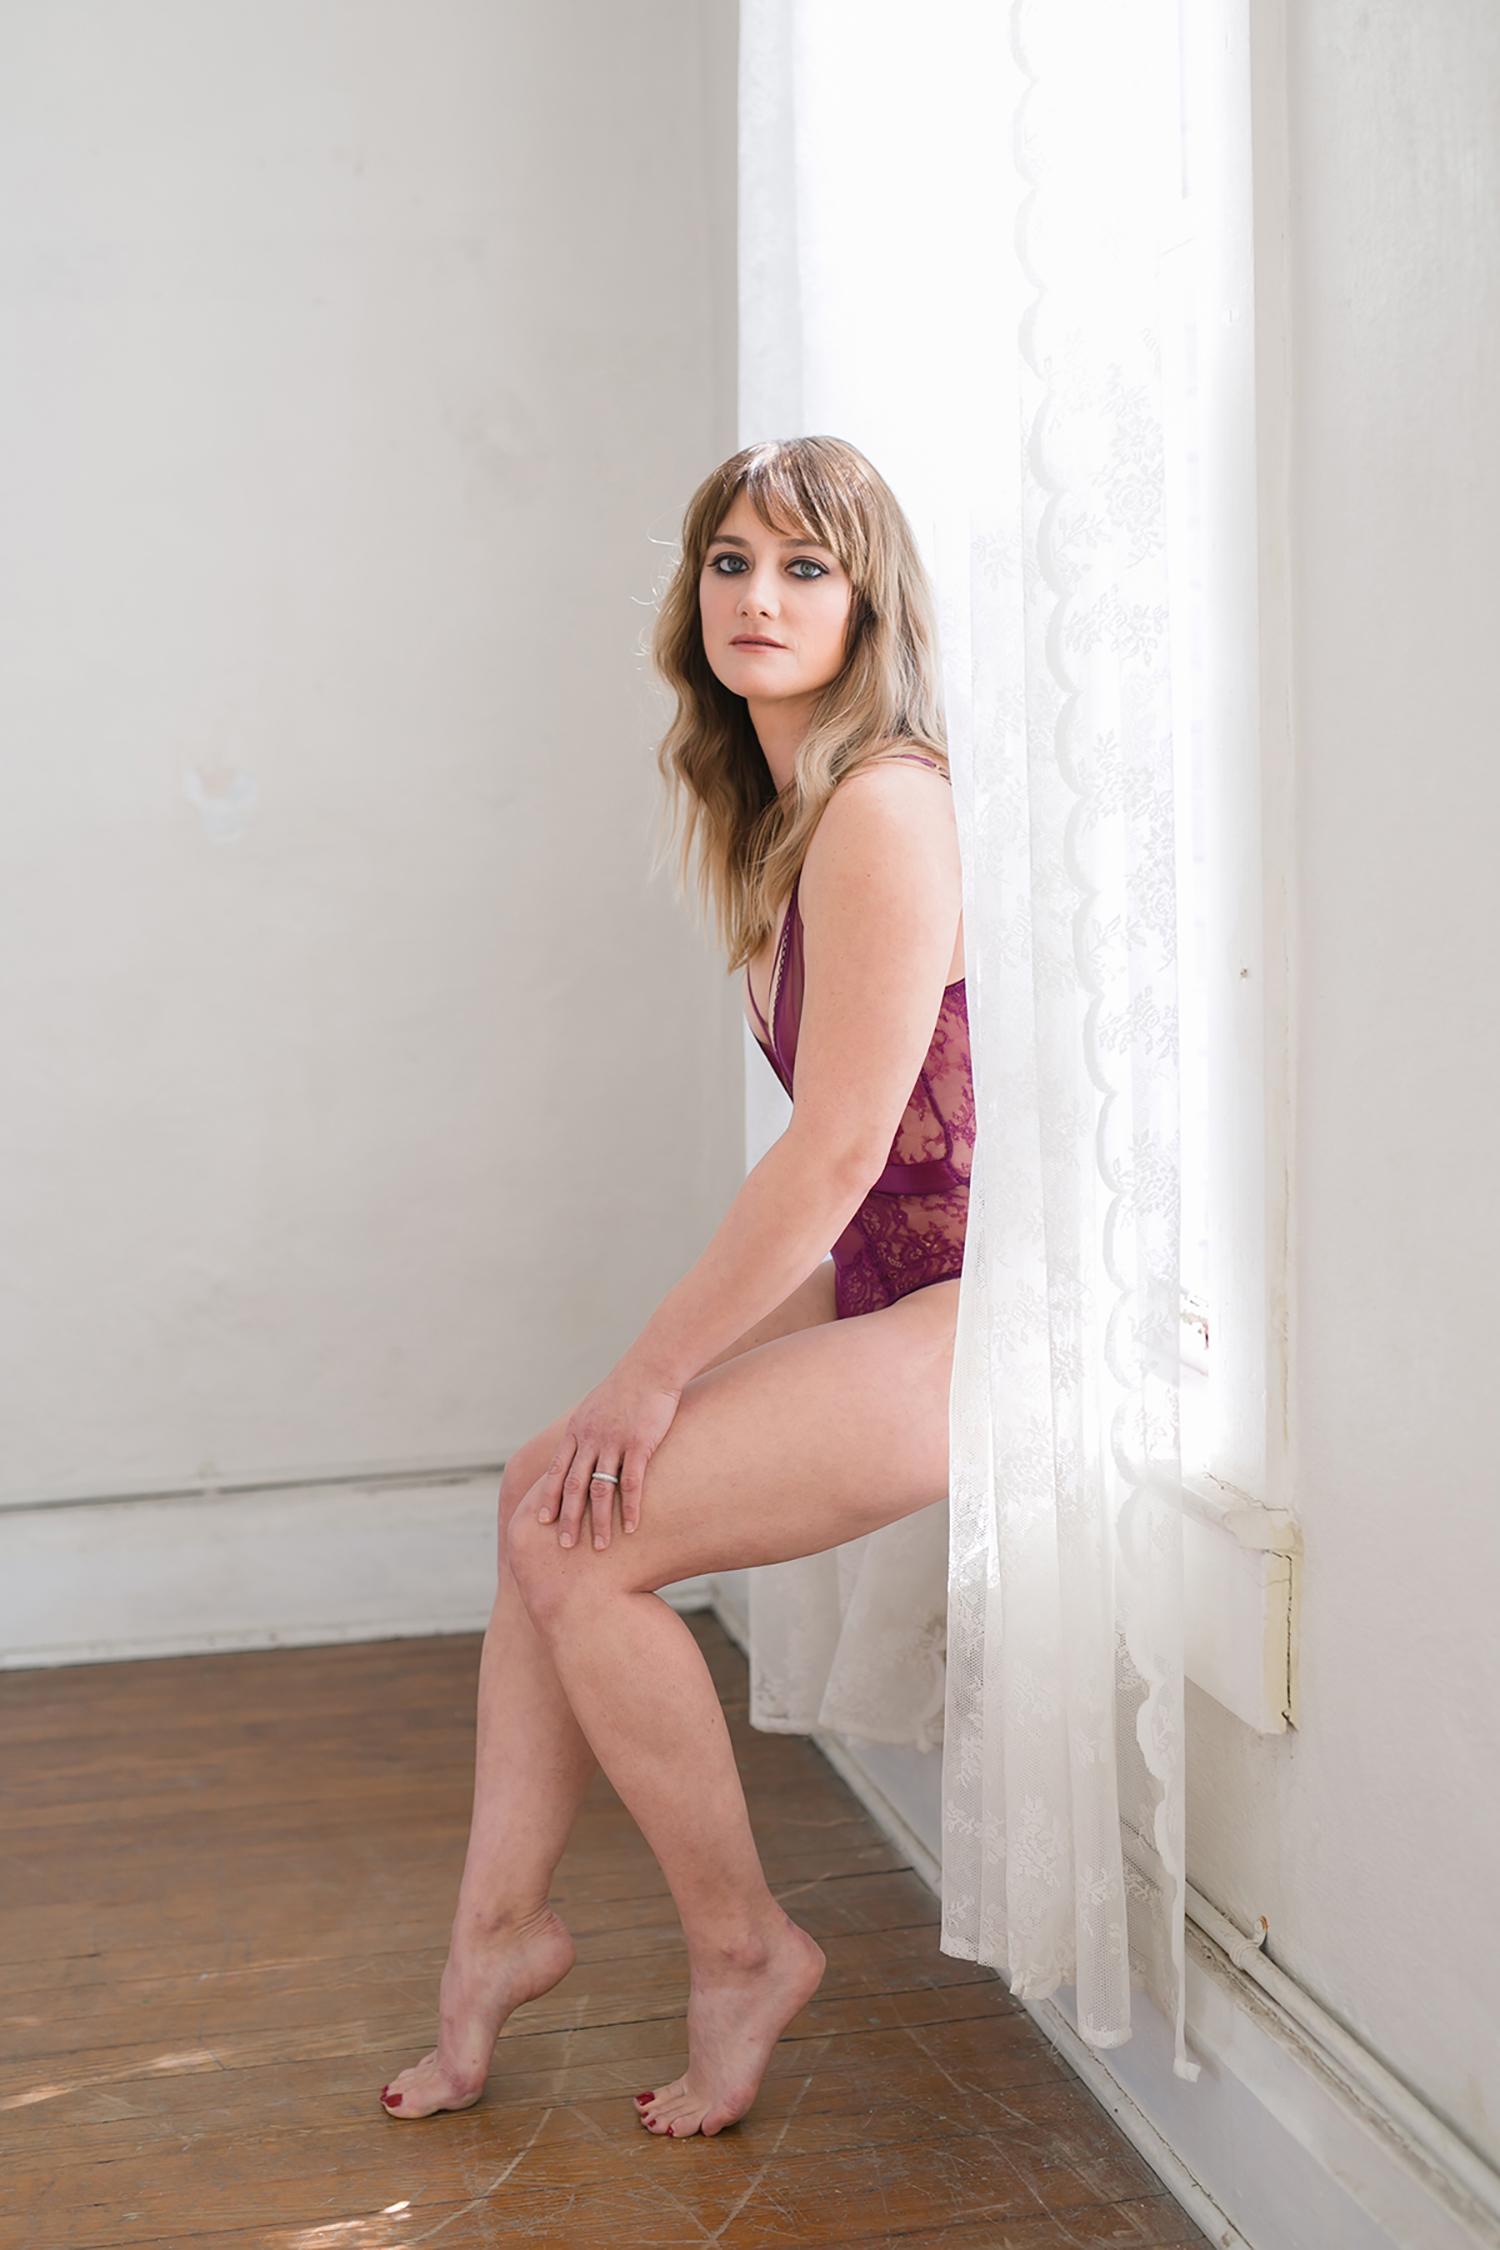 austin-atx-boudoir-artistic-nudes--kbb01.jpg